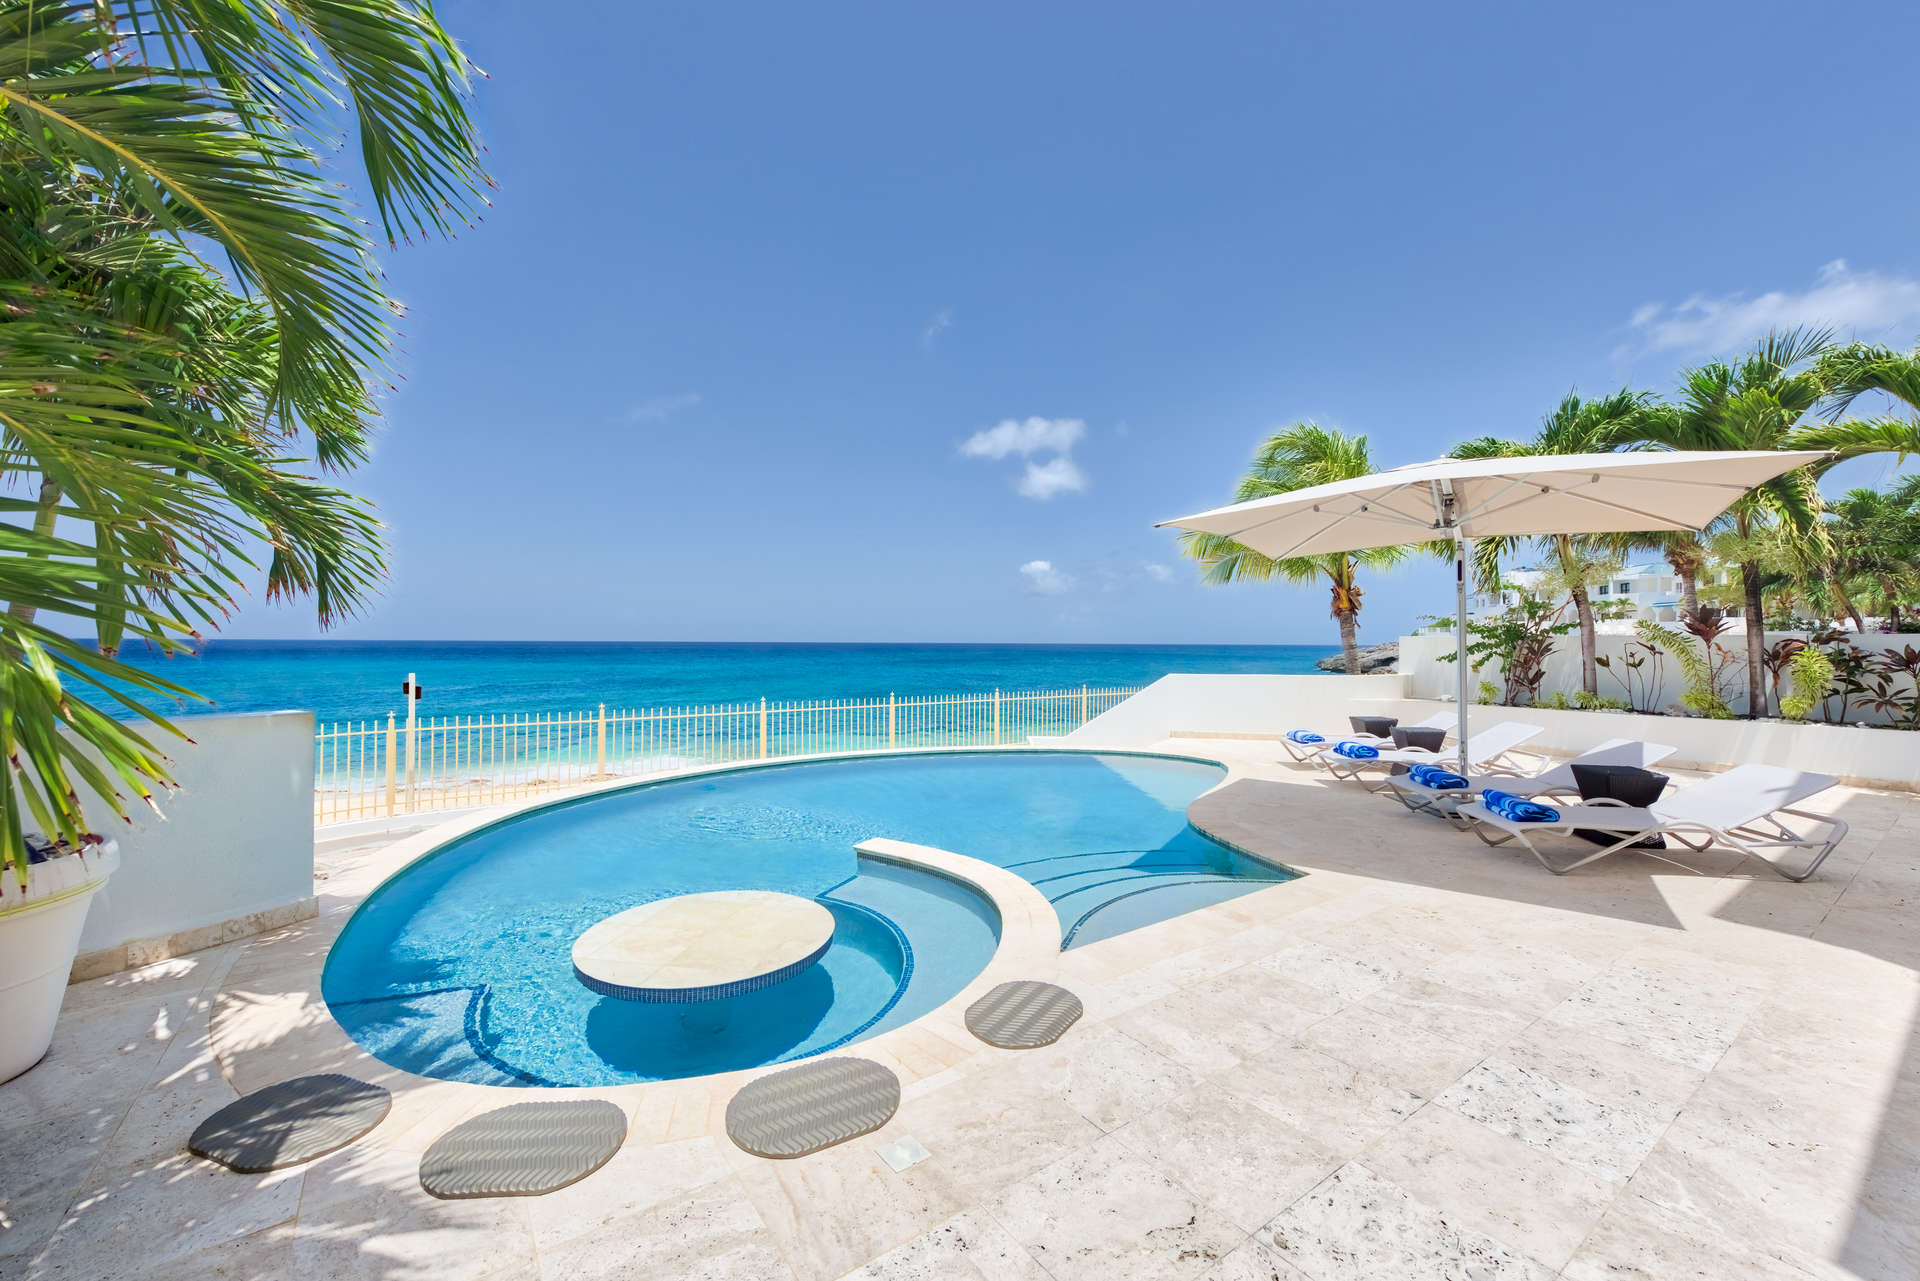 Luxury villa rentals caribbean - St martin - Sint maarten - Cupecoy - Bahari - Image 1/23